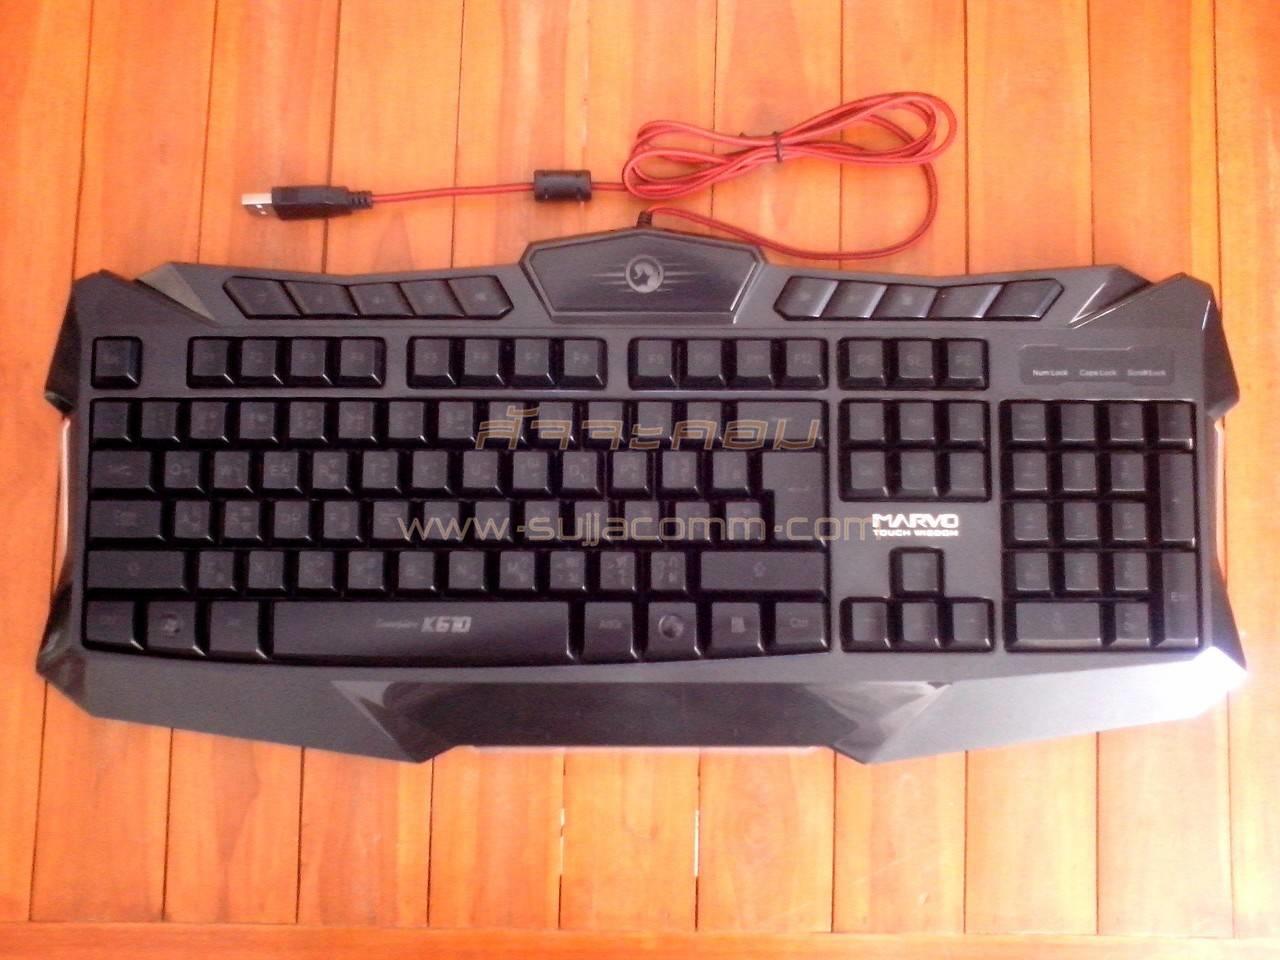 "USB Multi Keyboard ""Marvo"" (K610) Black ( ปรับไฟได้ 3 สี )"